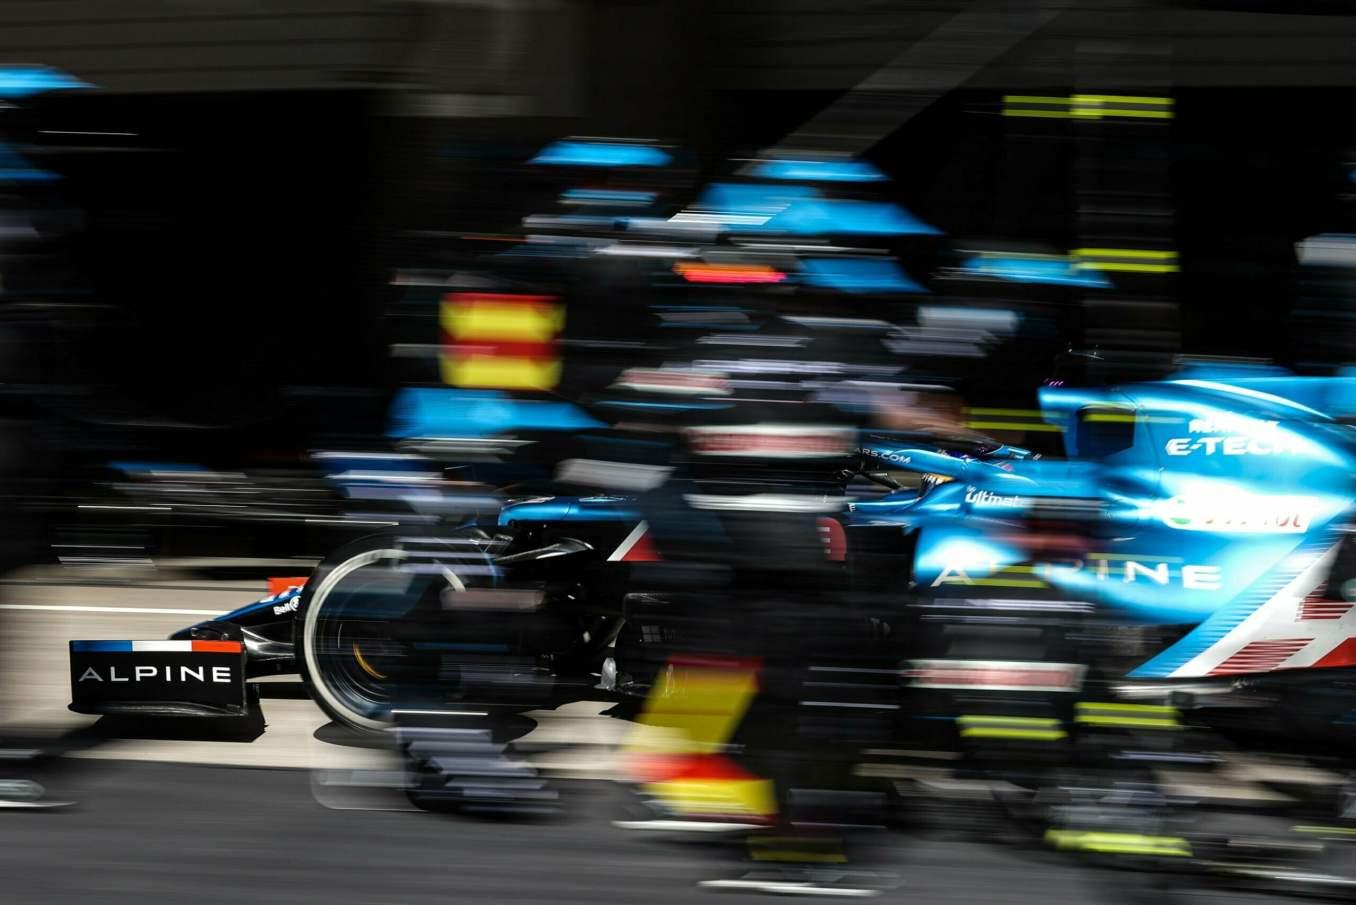 Alpine F1 Team A521 Alonso Ocon Grand Prix Portugal Course 33 scaled | Alpine F1 Team poursuivra sa progression au Grand Prix d'Espagne 2021